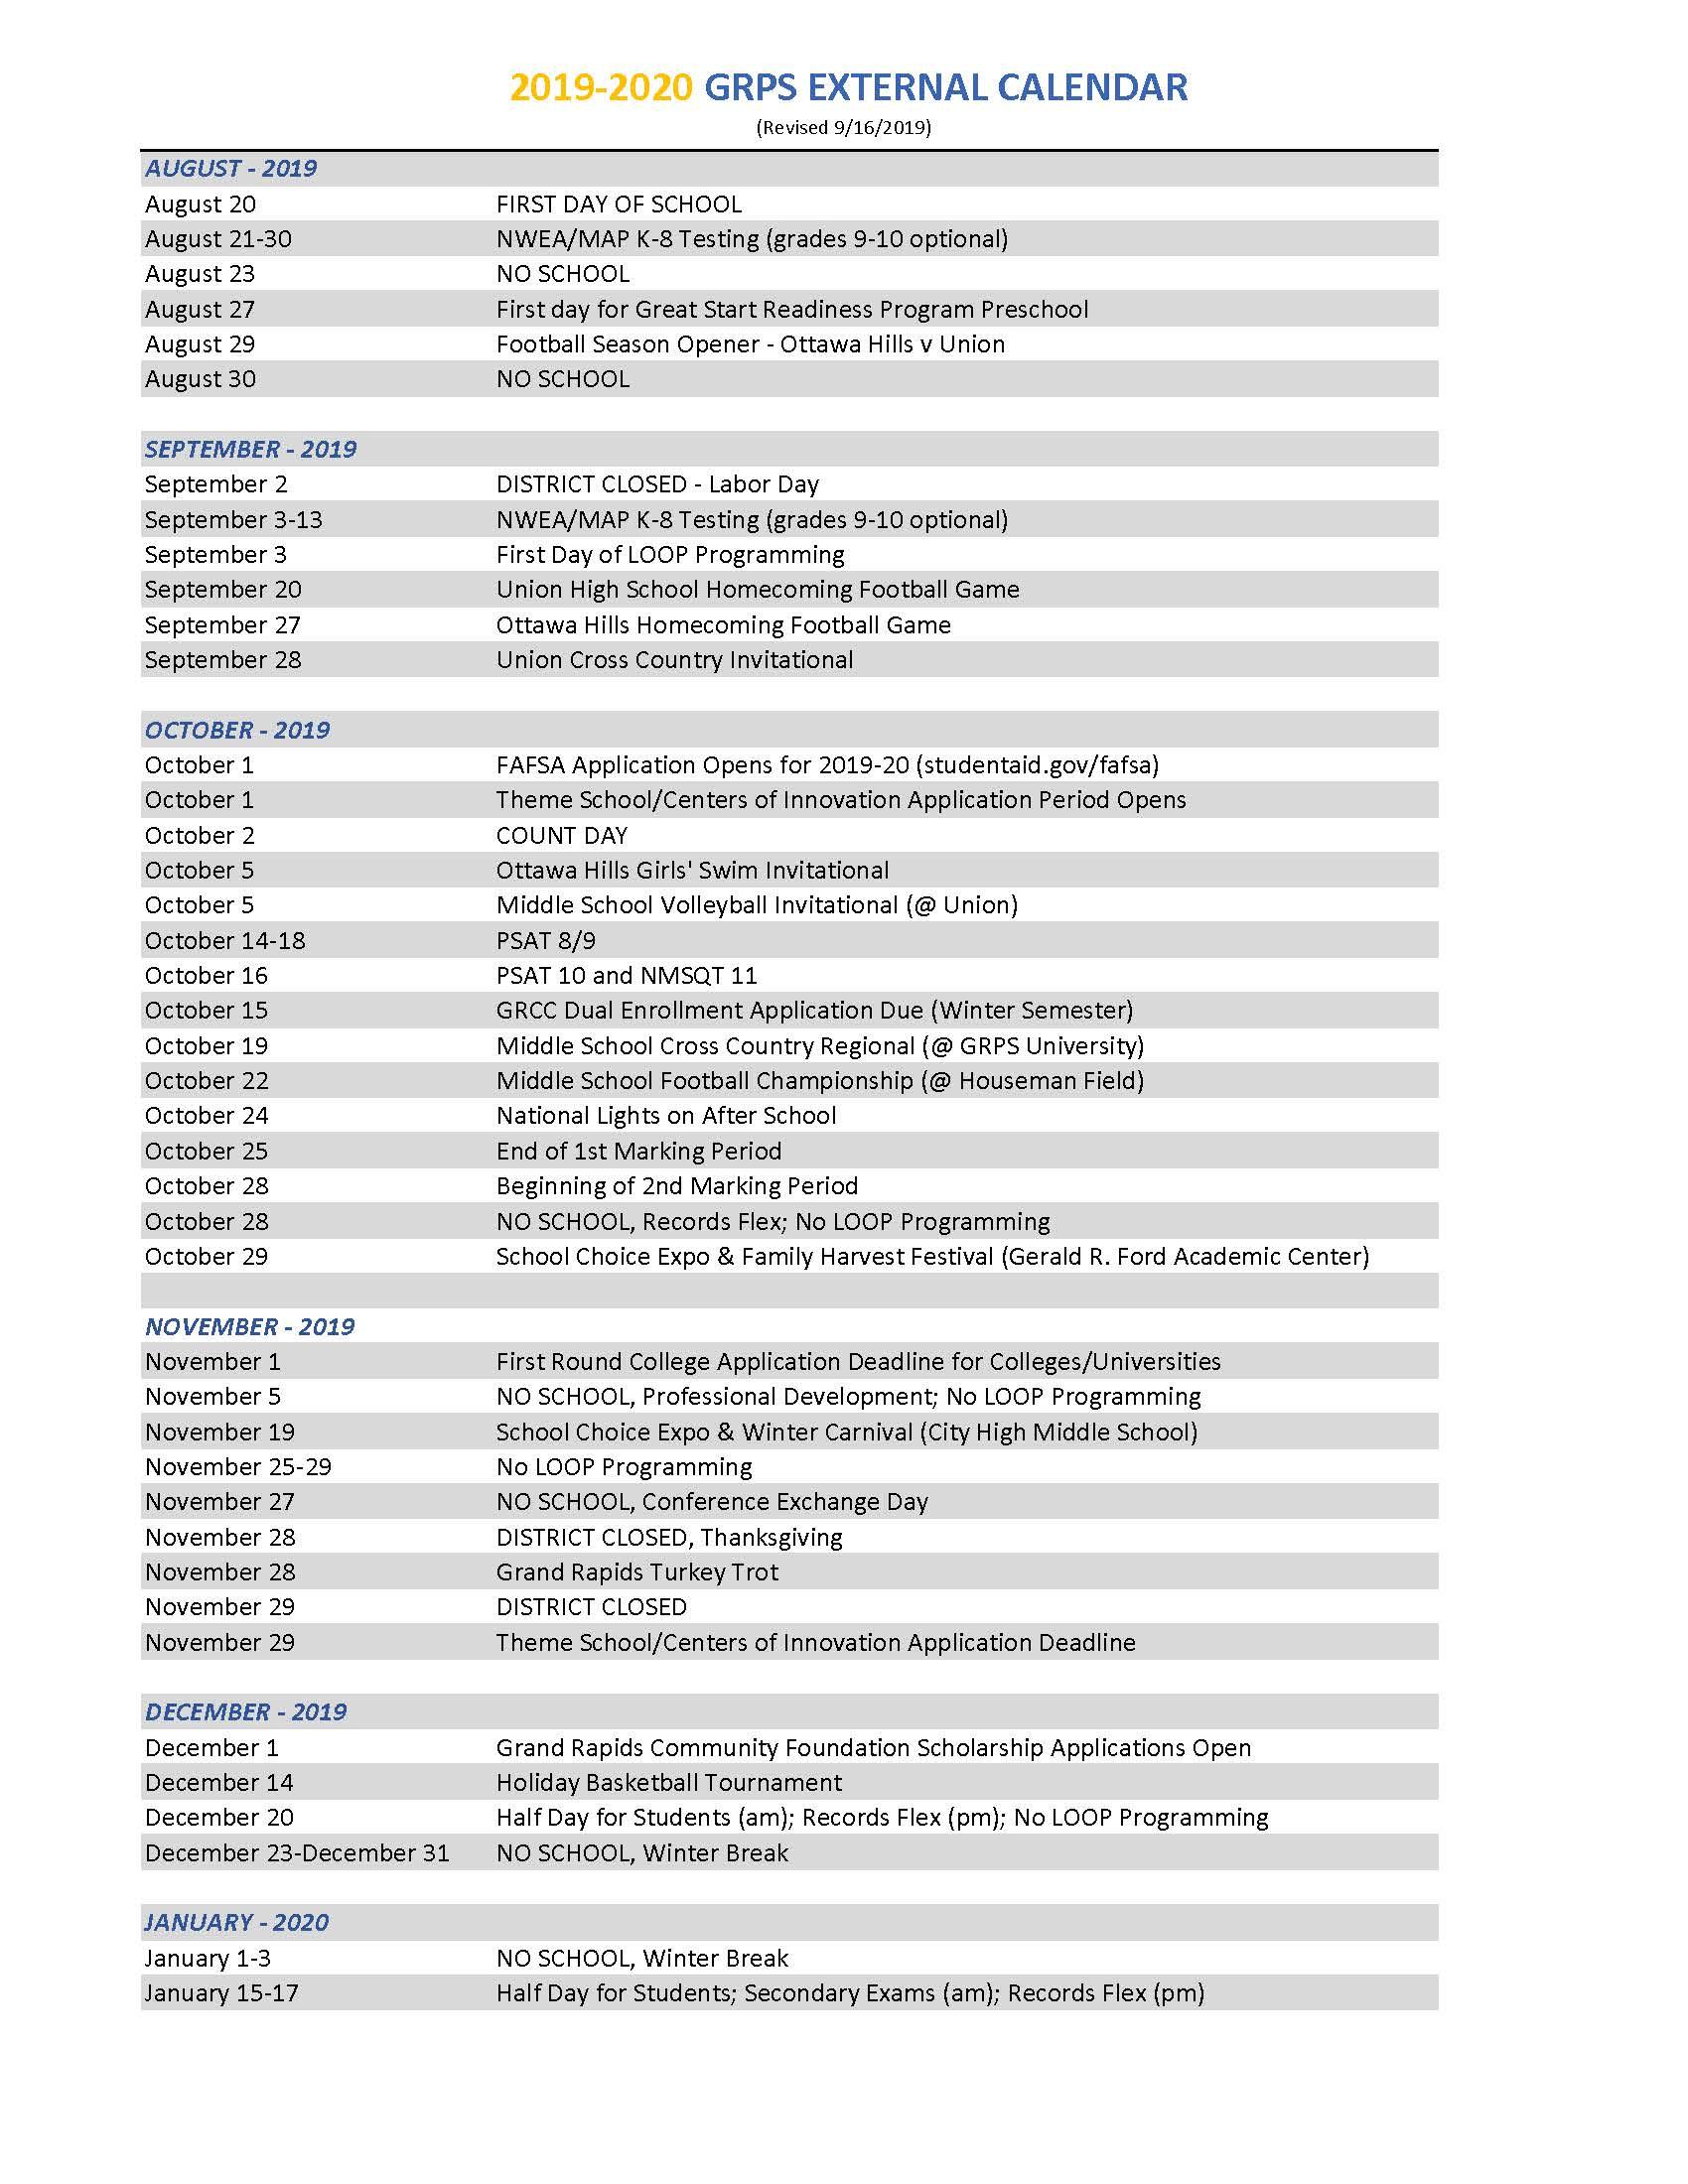 2019-2020 District Calendar with regard to Grand Haven High School Calendar